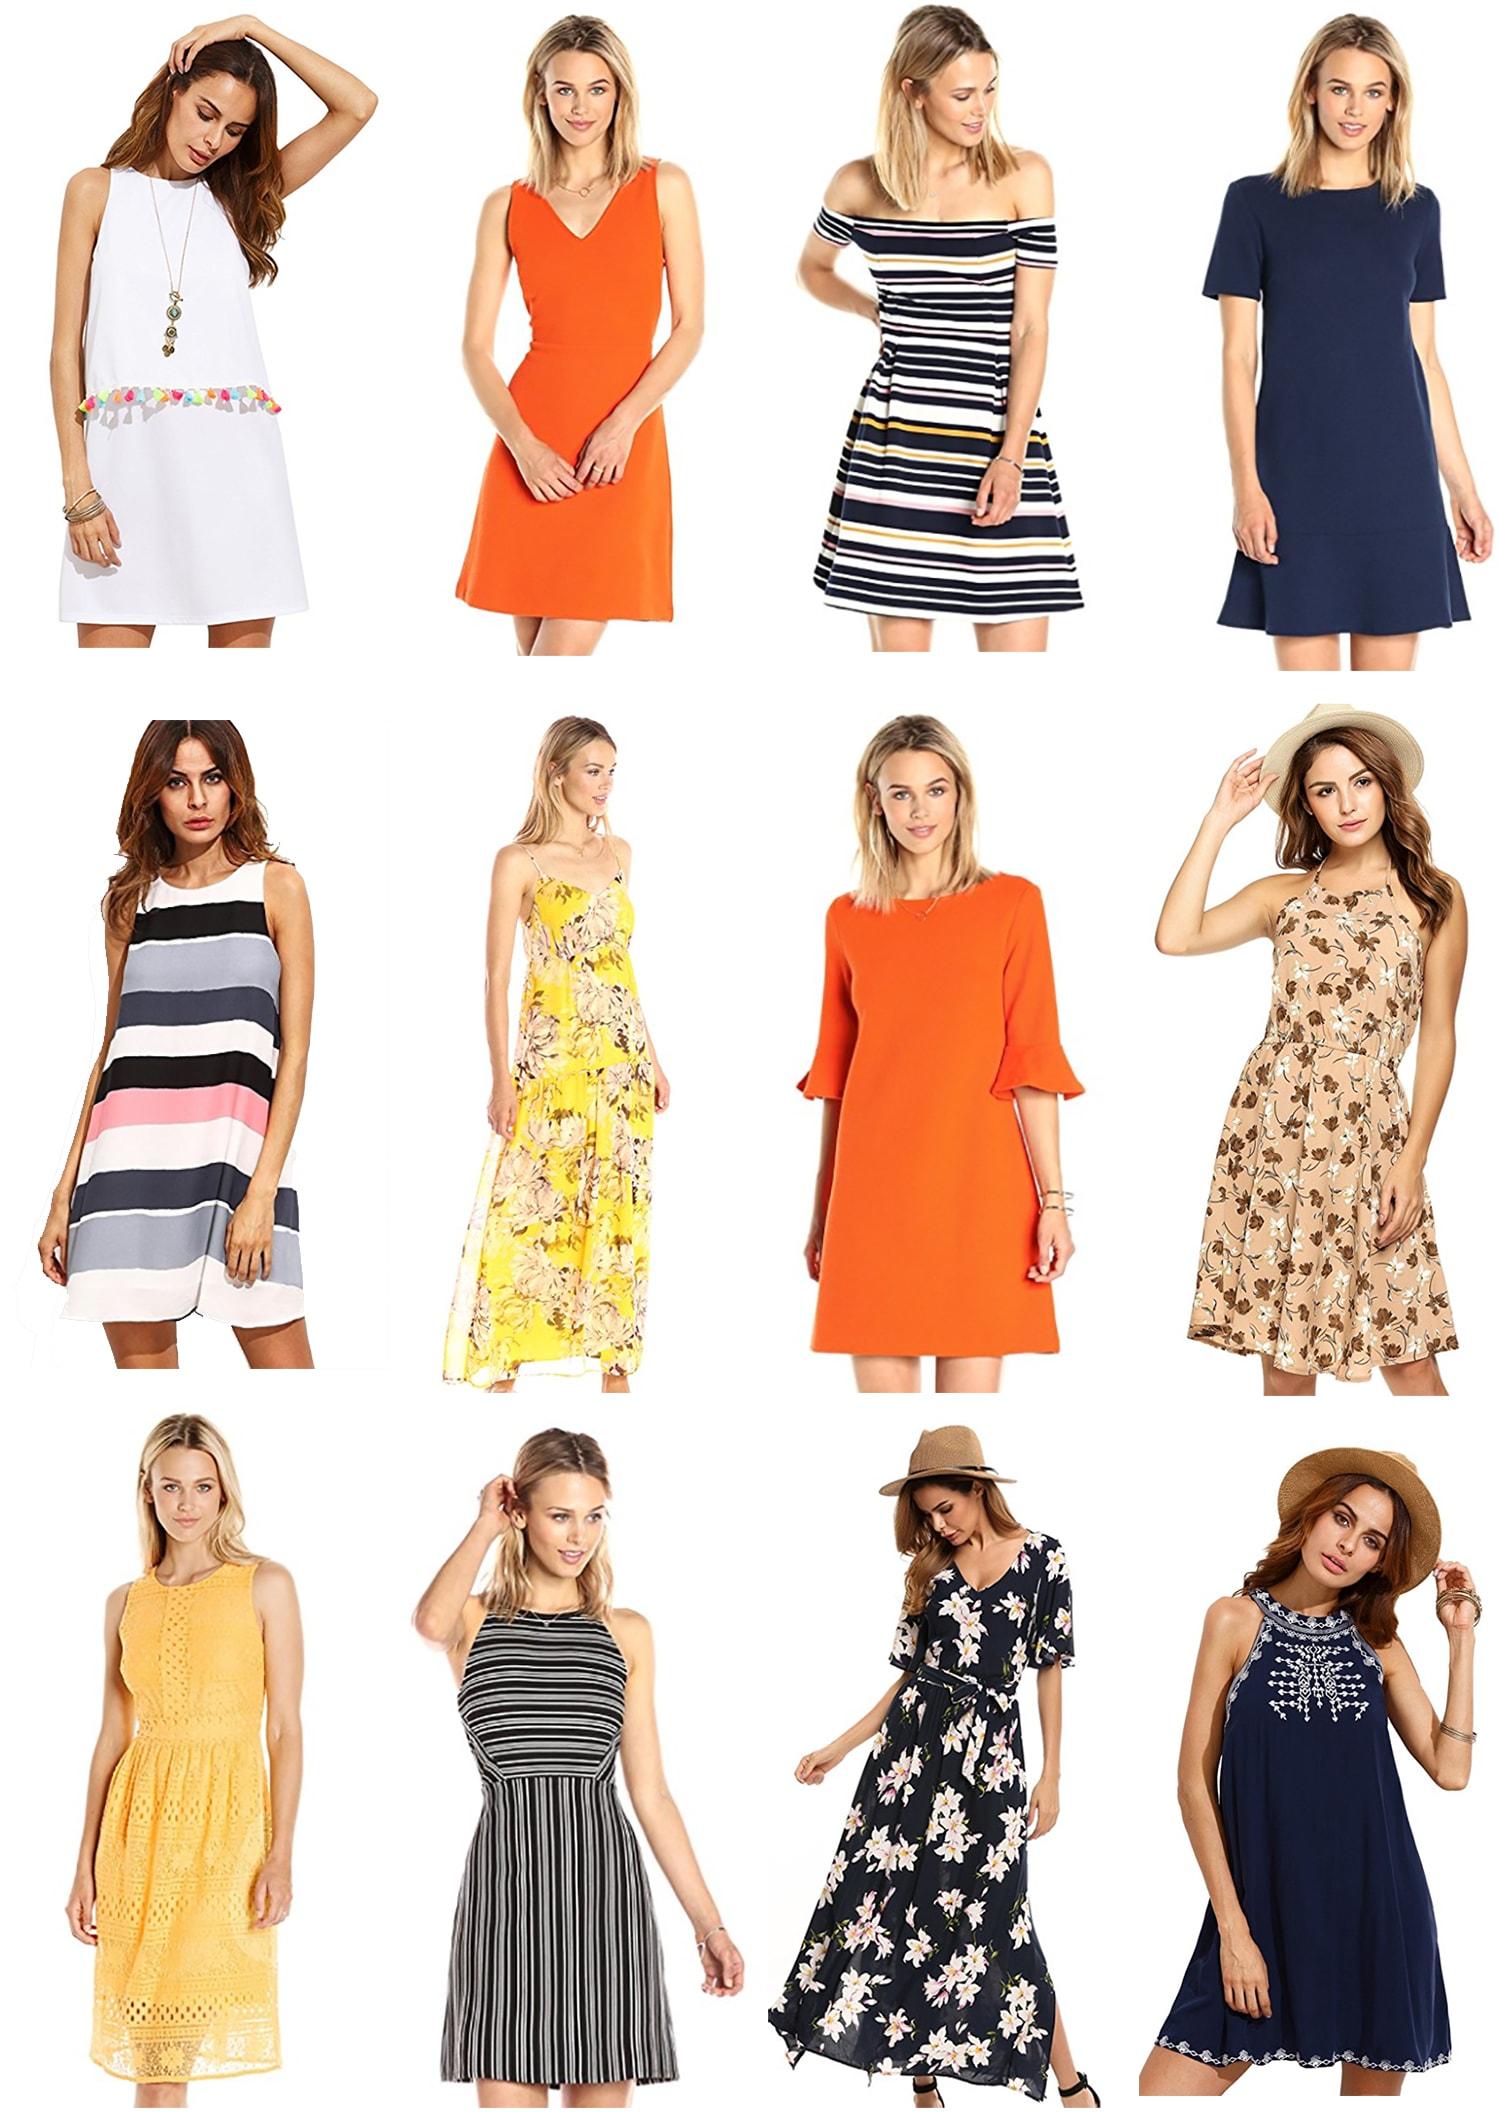 Dresses That Ship Free With Amazon Prime Ashley Brooke